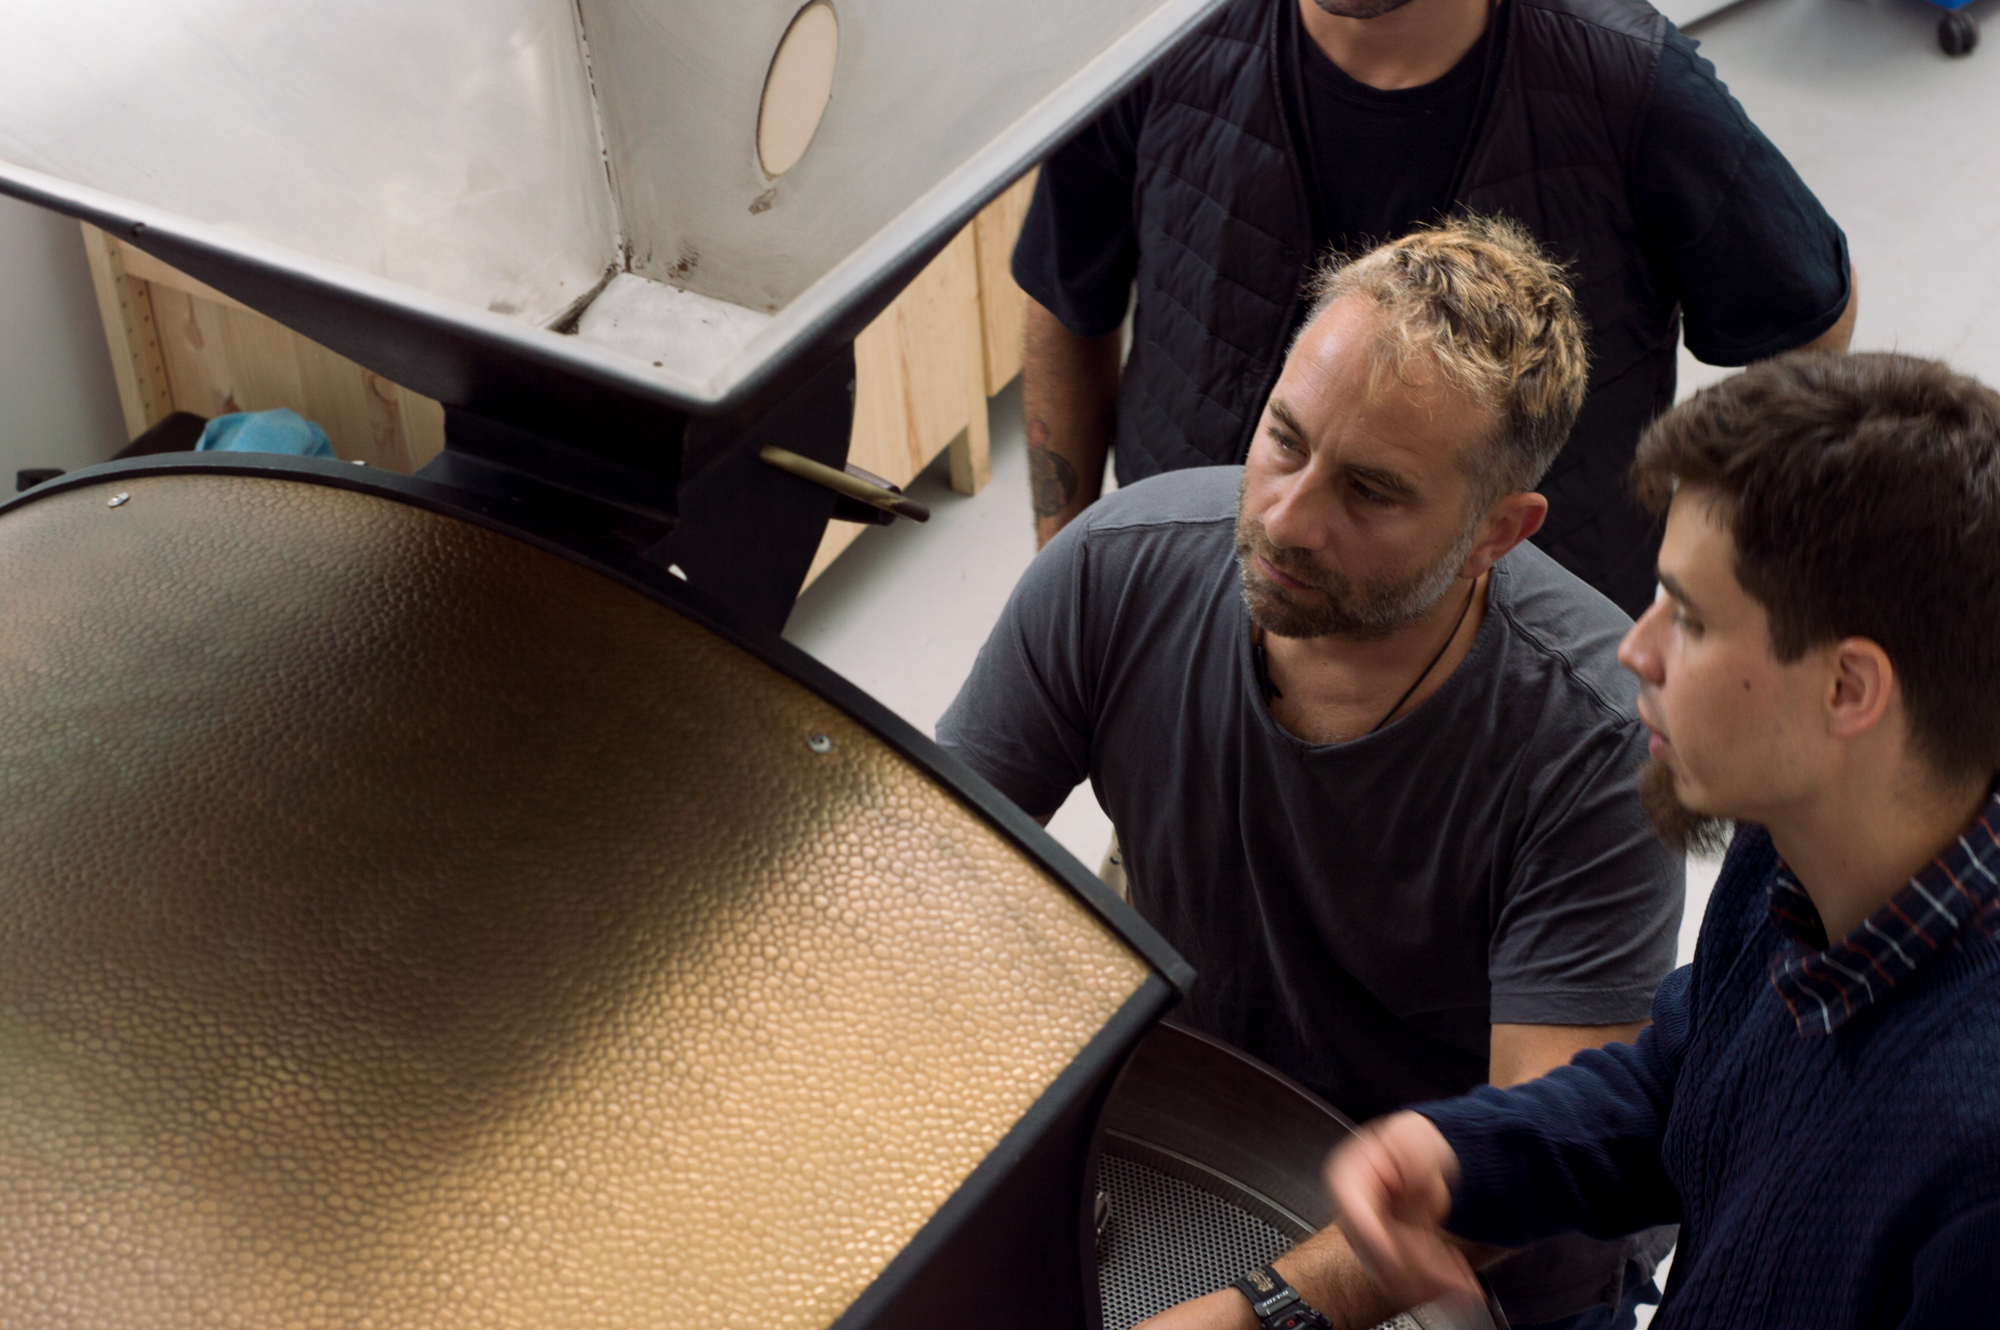 Director Edy Piro and Head roaster, Julian configuring the machine.